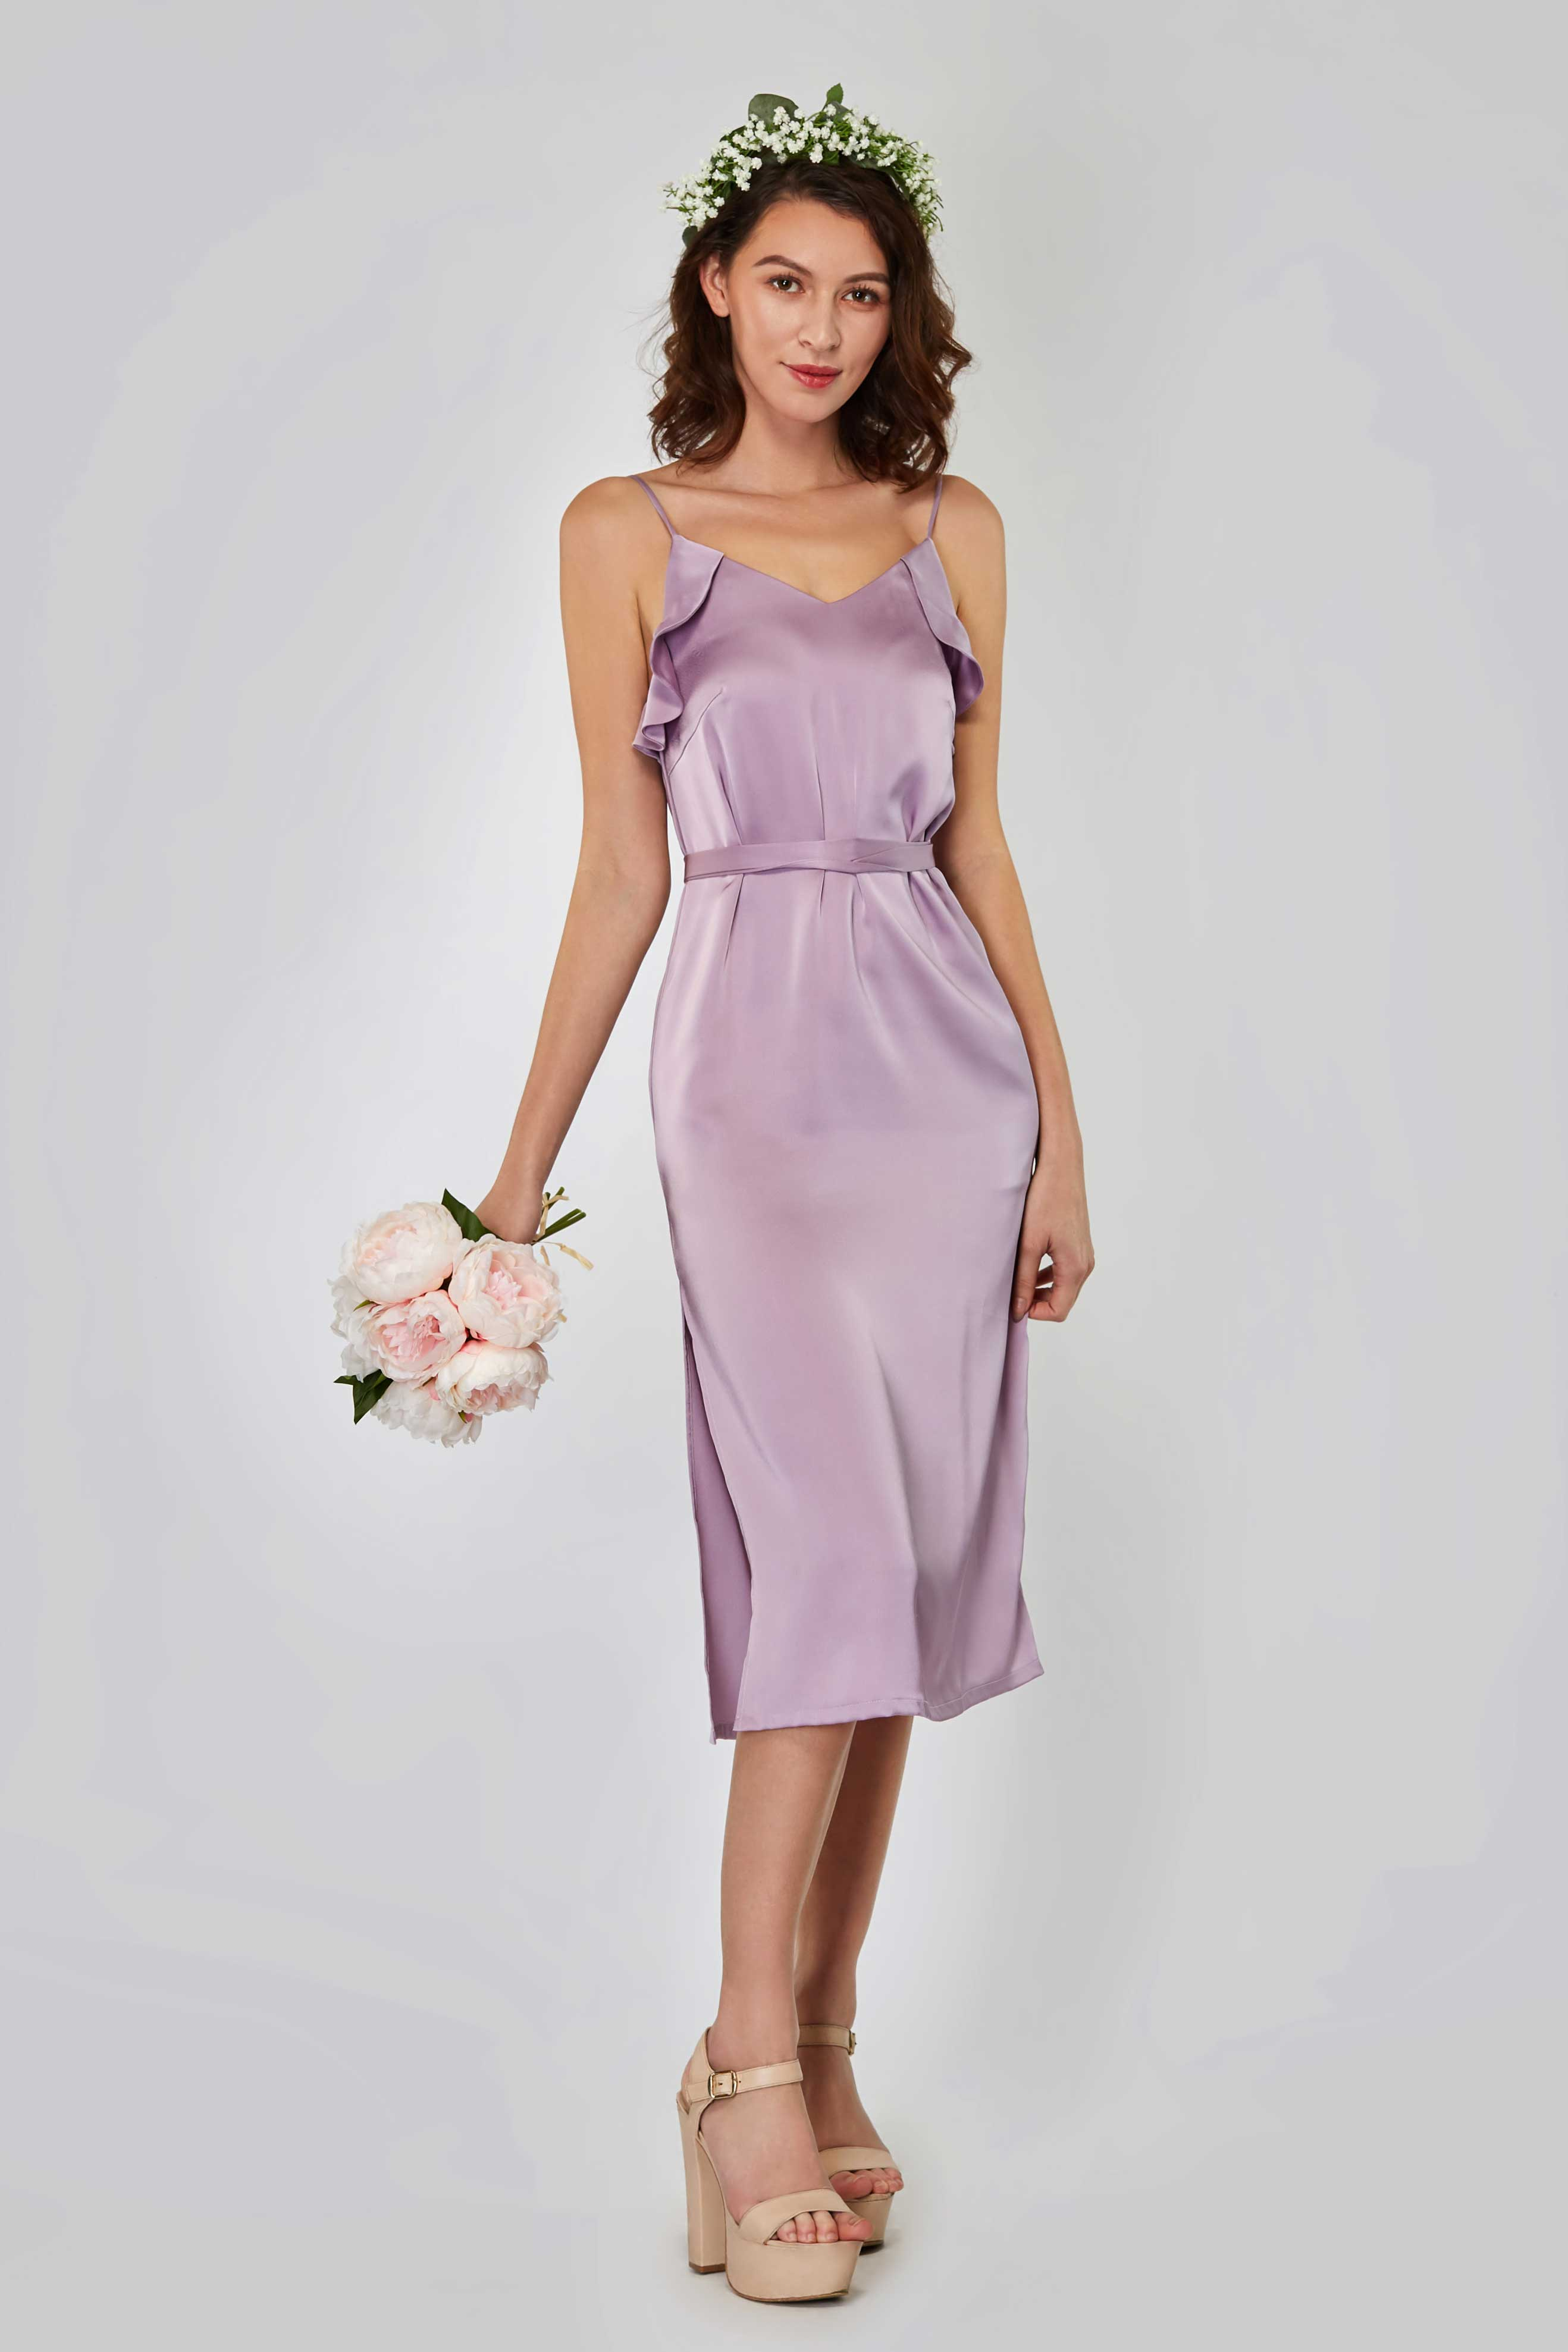 dirt cheap discount sale first rate Rita Satin Midi Dress - Baby's Breath Bridesmaids